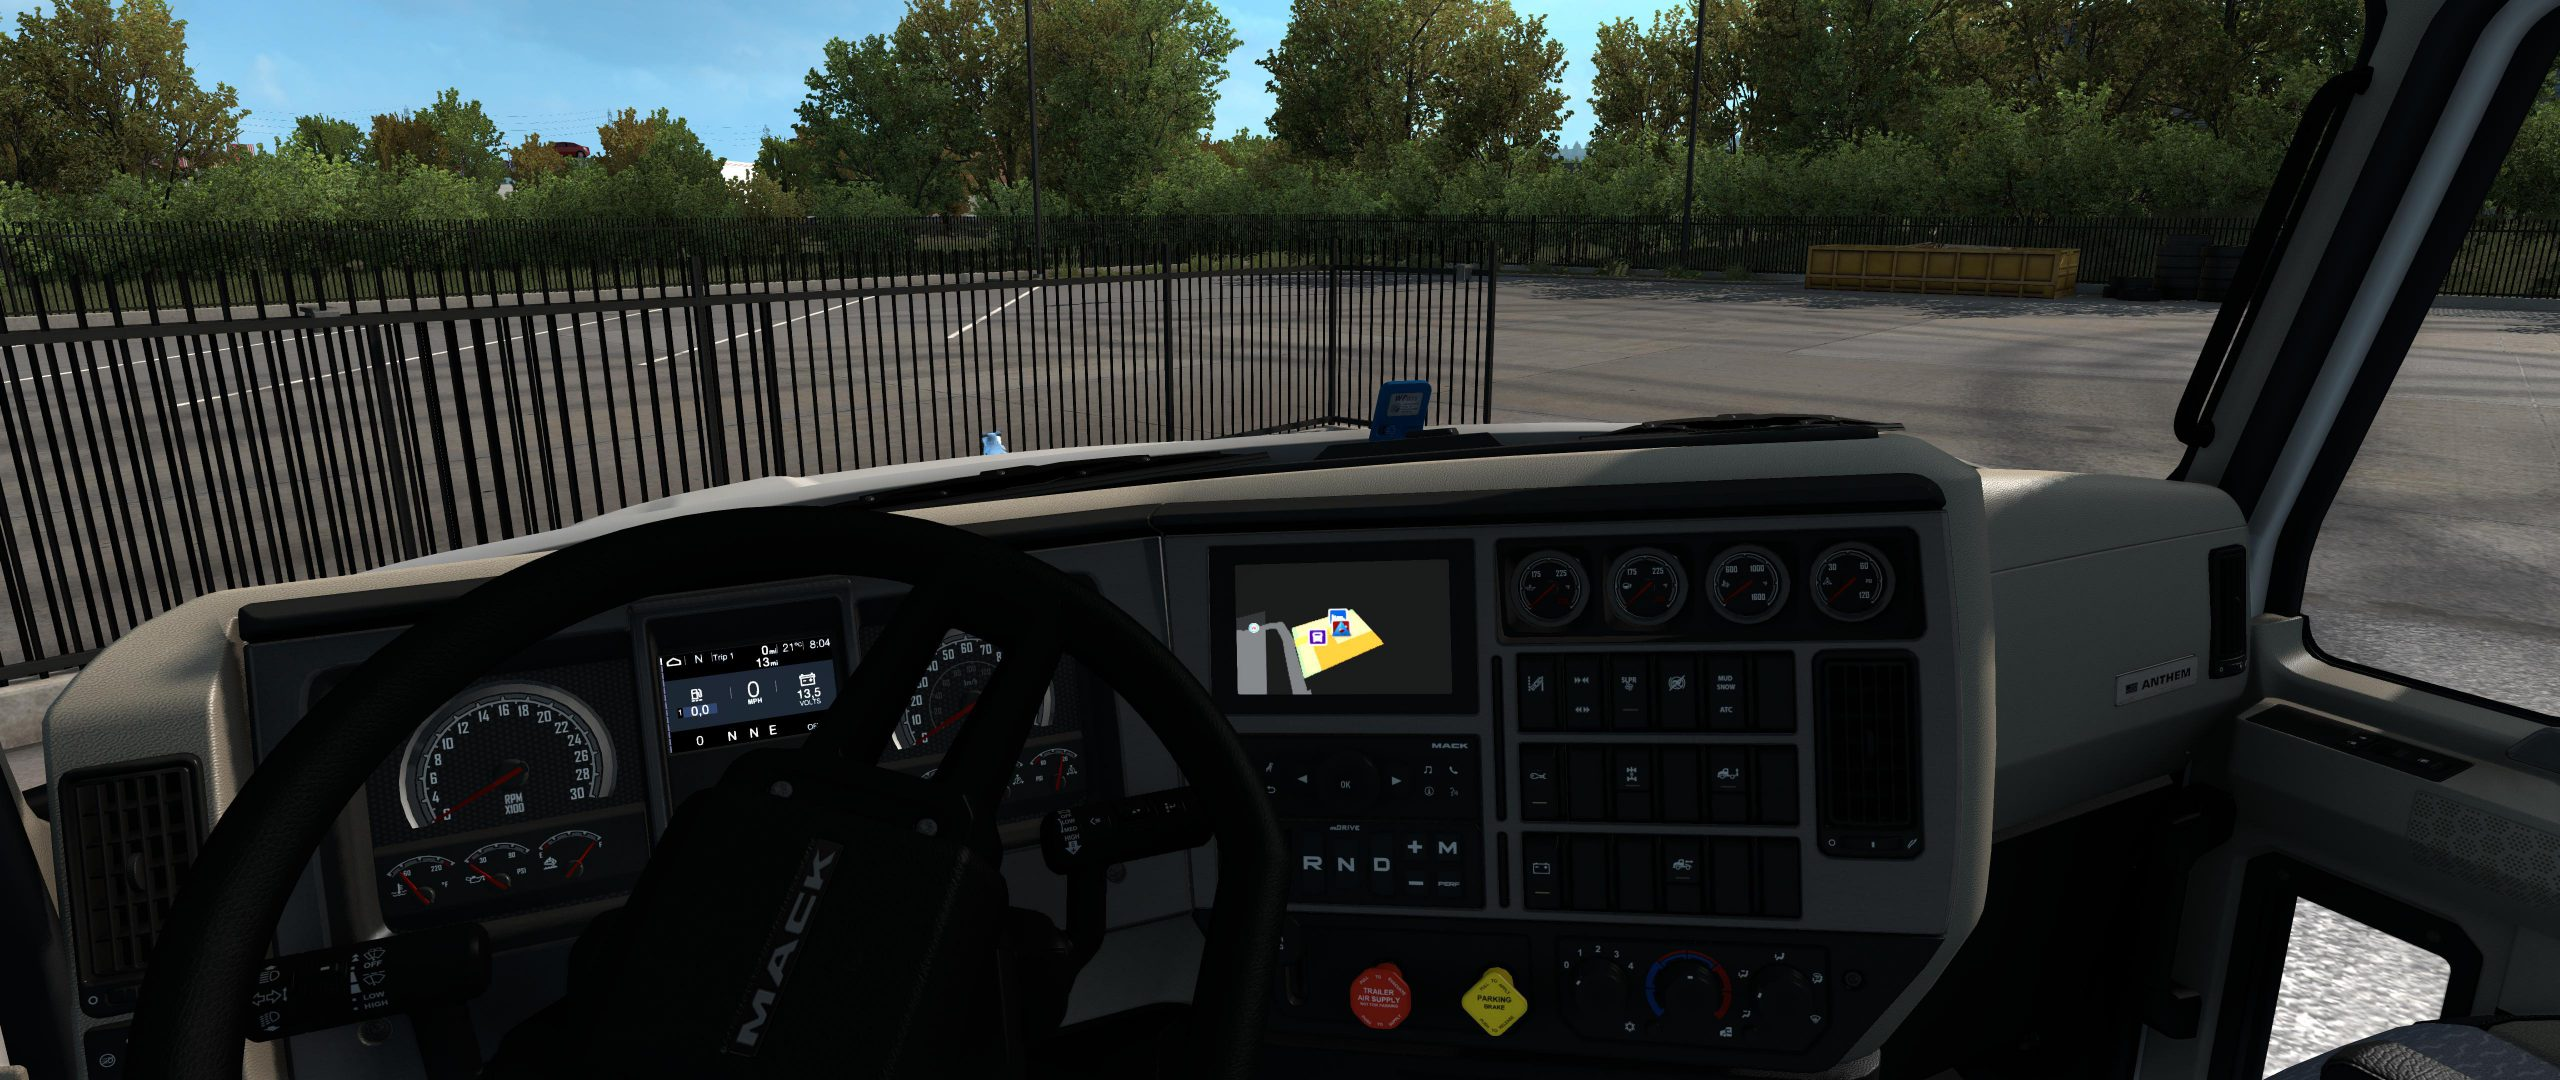 MACK ANTHEM DAYCAB GPS 1.38